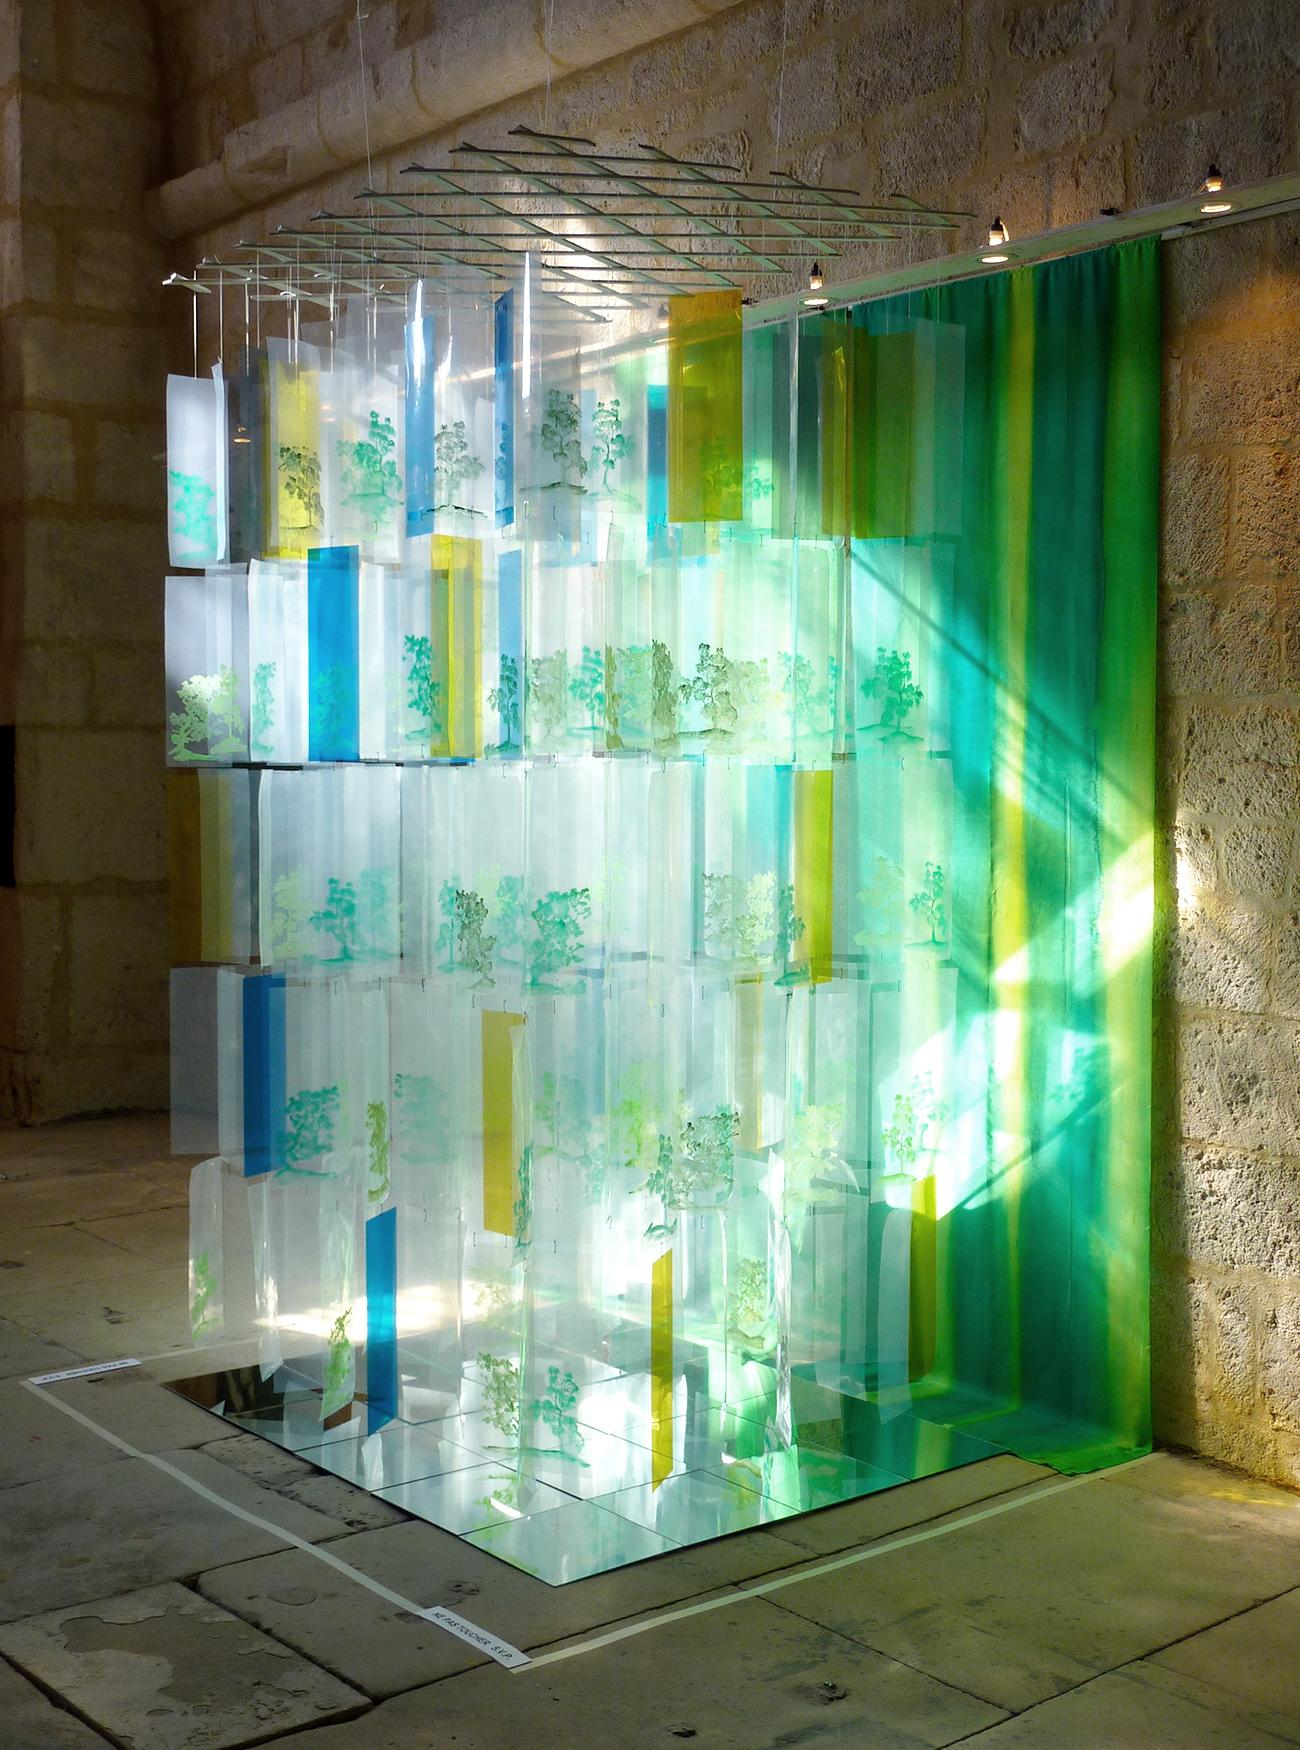 ulla-kern-installation-gaerten-konstruierte-natur-02